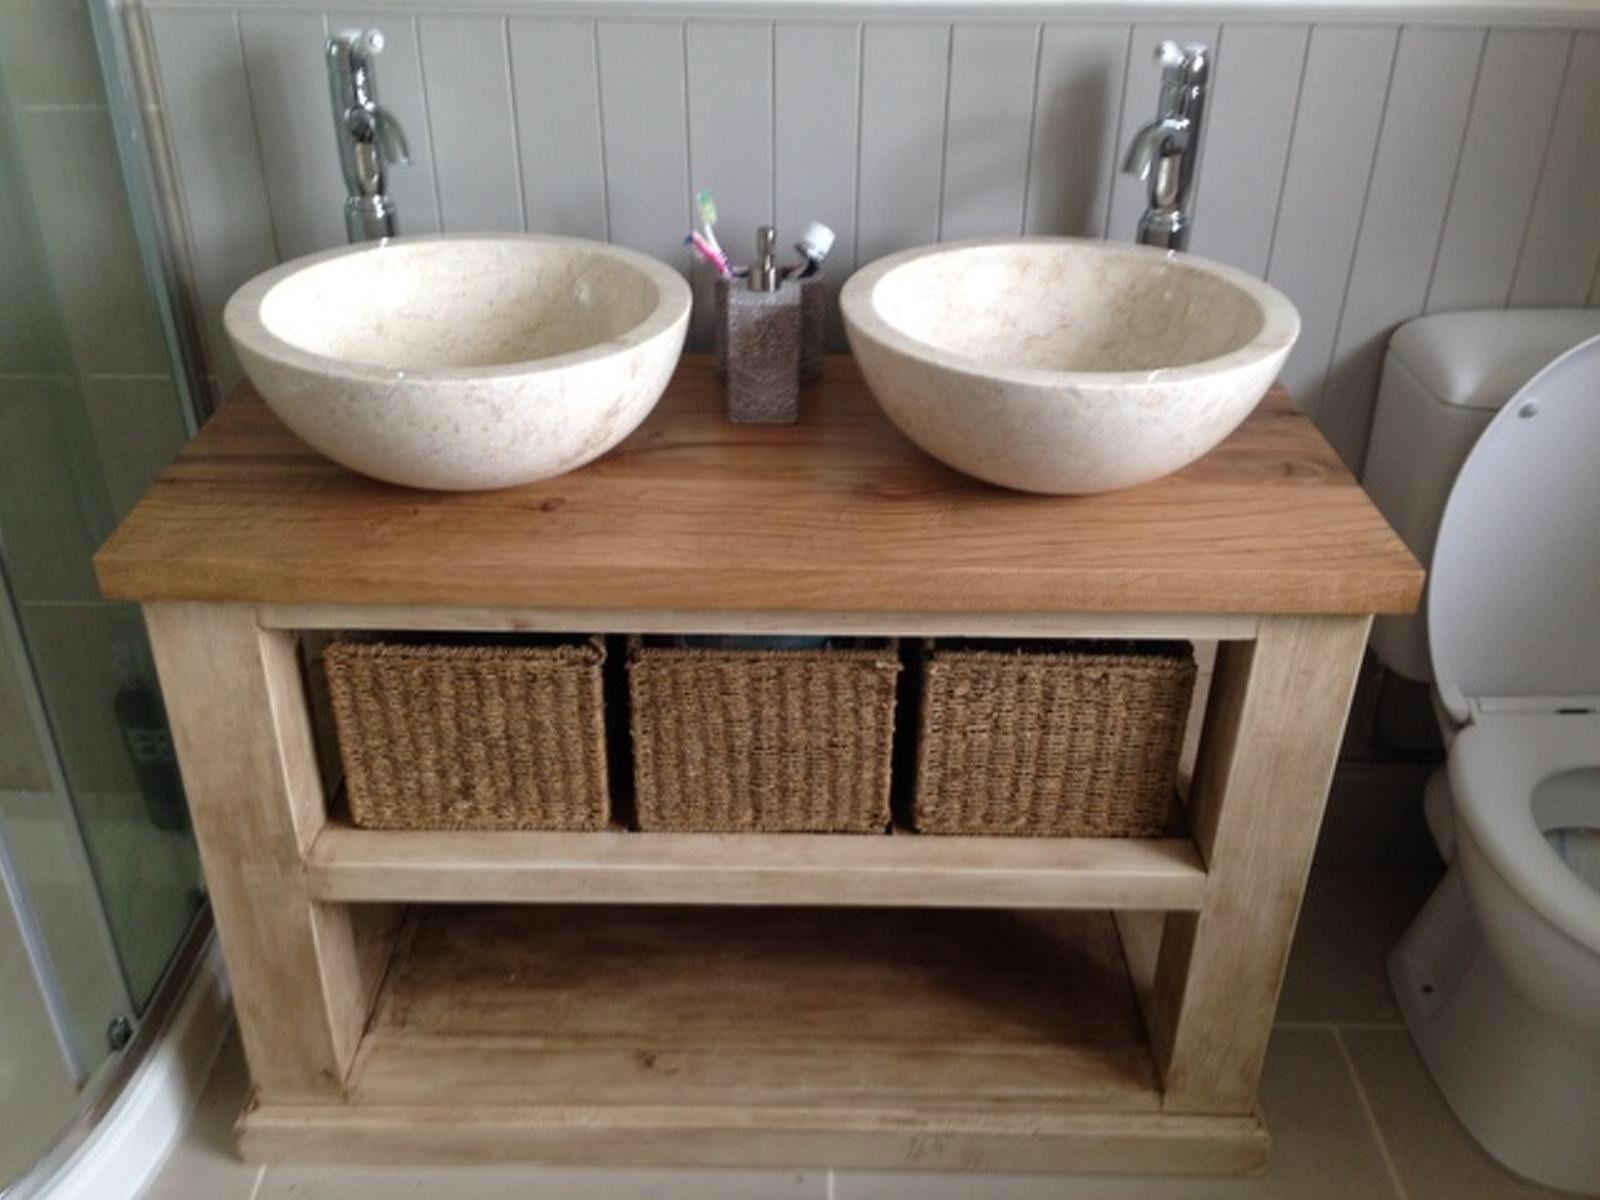 Bathroom Suites Ebay Handmade Solid Oak Bathroom Vanity Unit Washstand Rustic